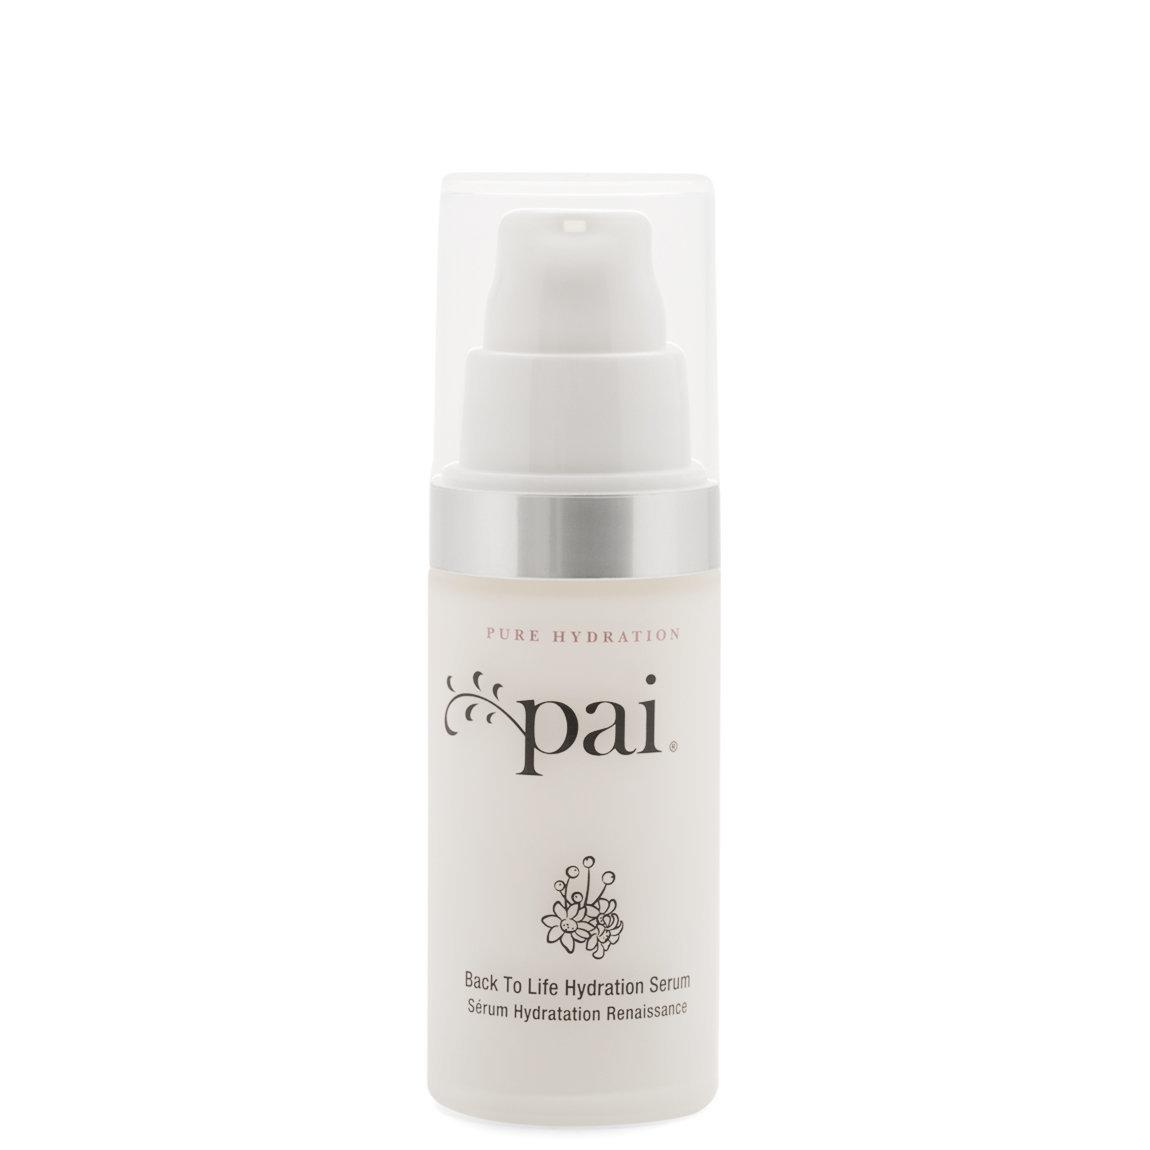 Pai Back To Life Hydration Serum